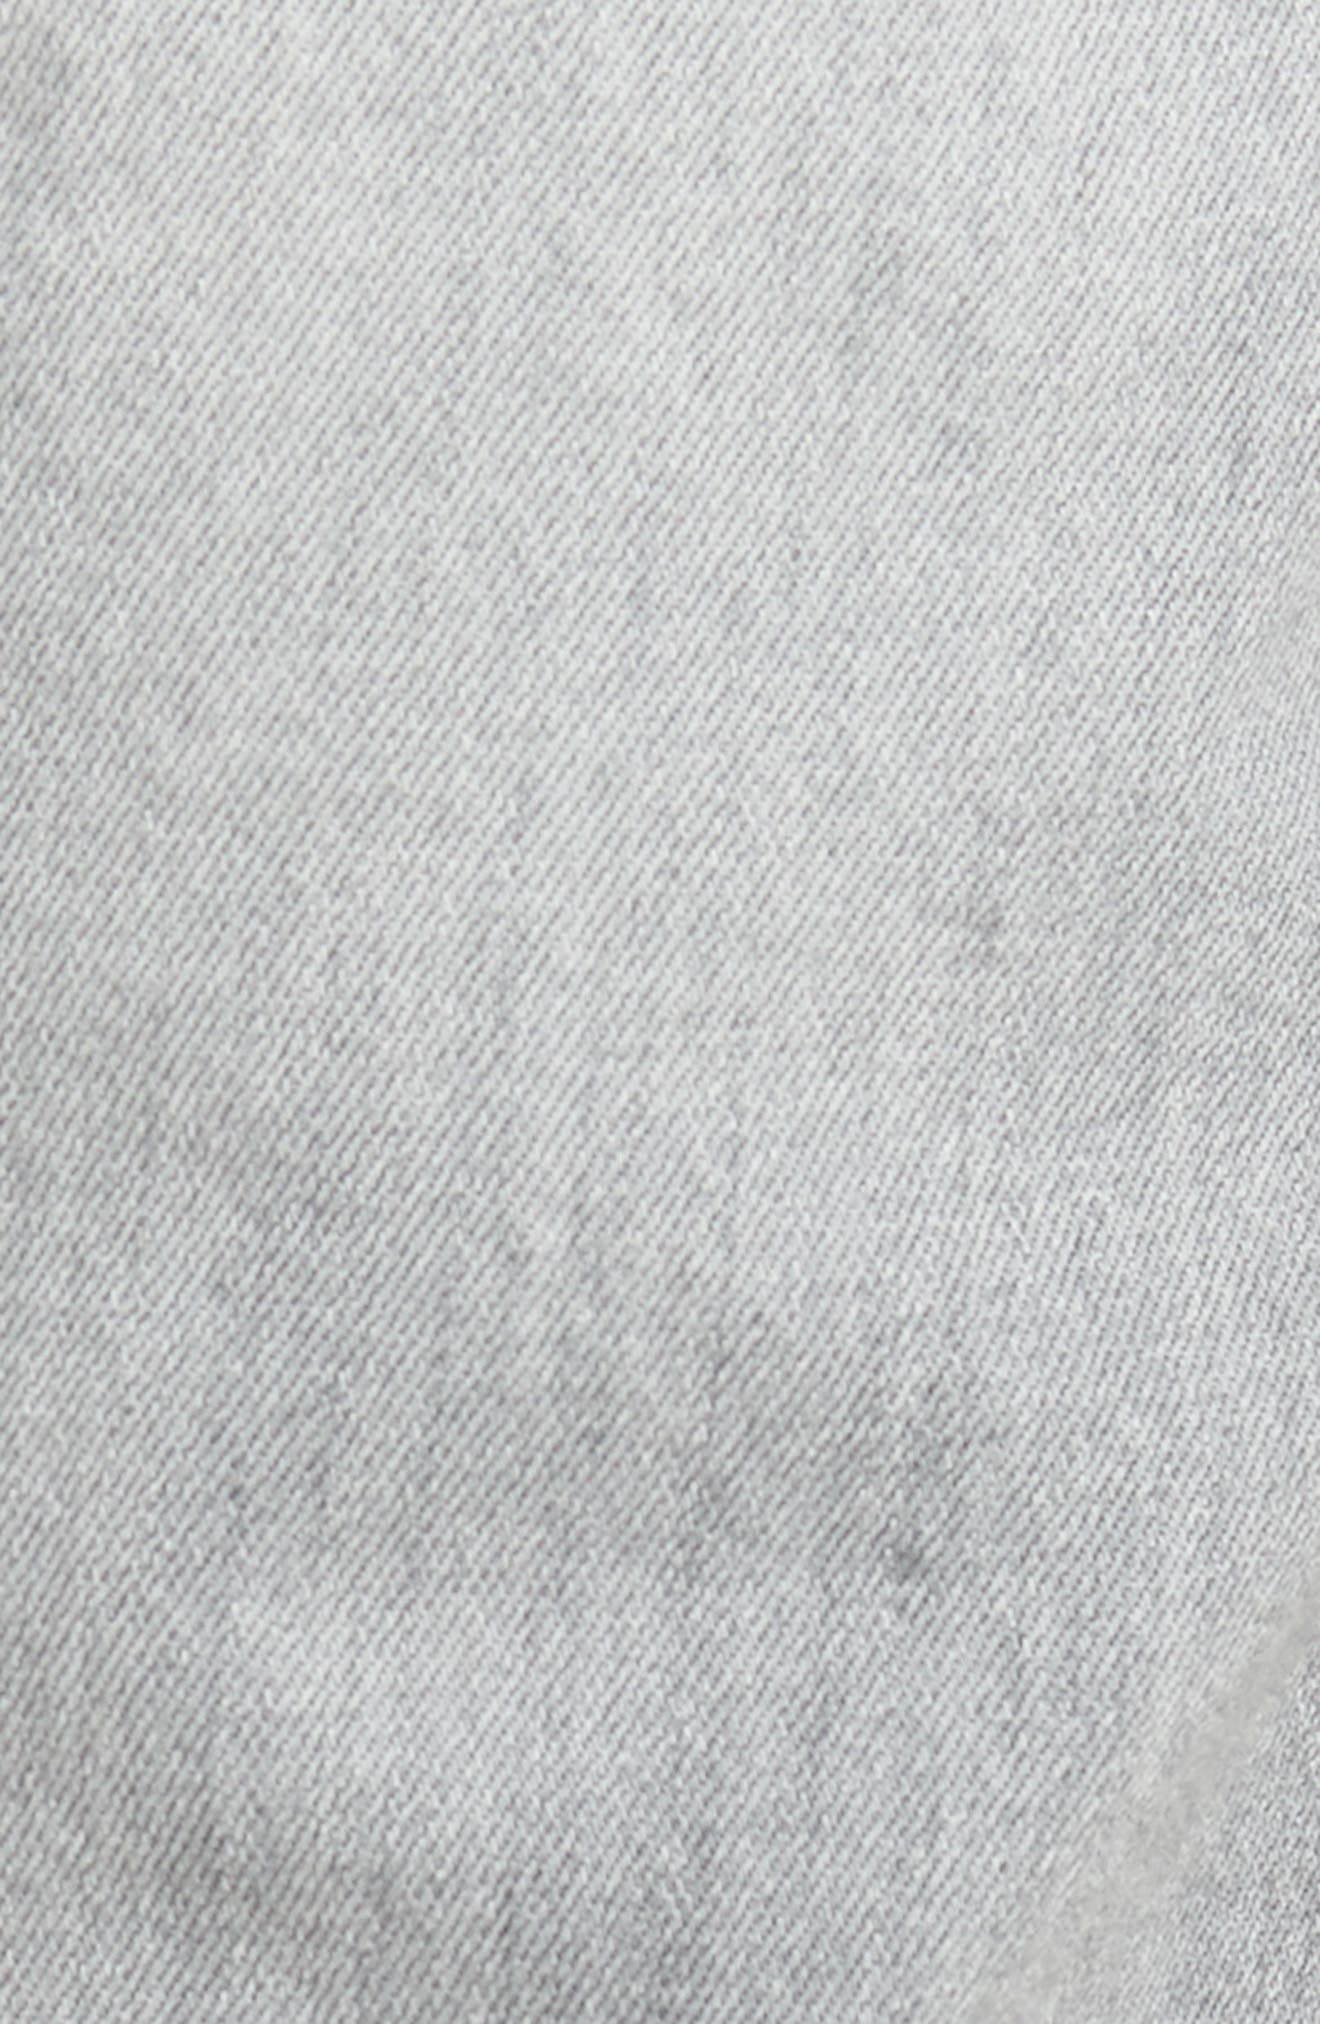 Graduate Slim Straight Leg Jeans,                             Alternate thumbnail 5, color,                             21 Years Outline